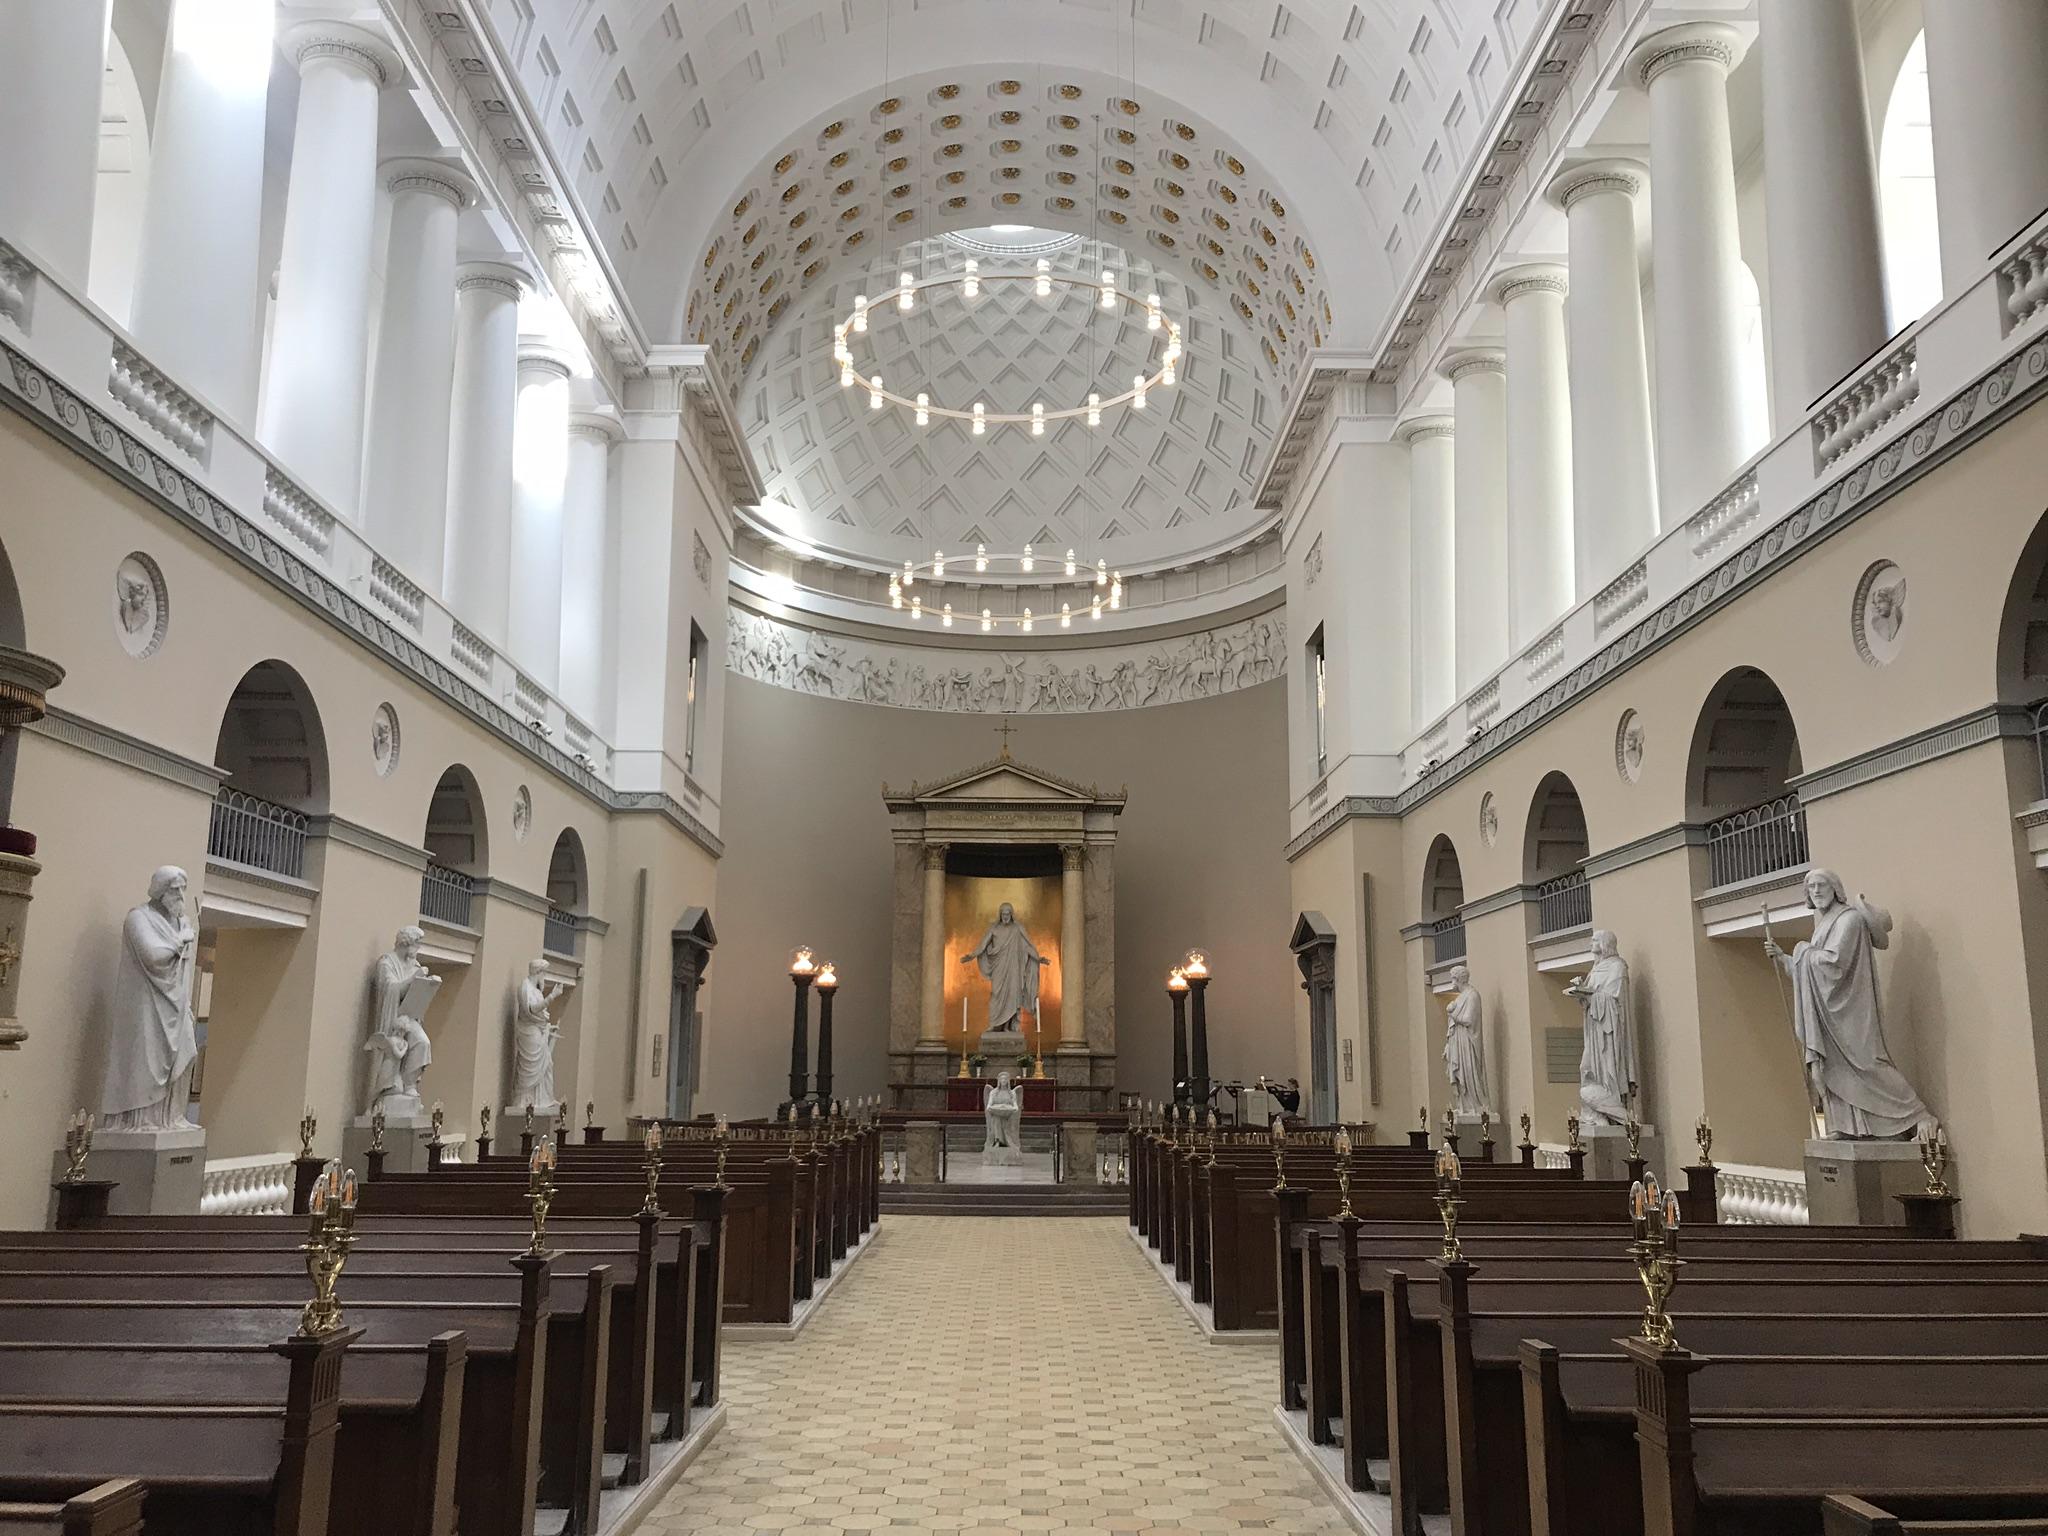 Bertelsen & Scheving Akitekter, Vor Frue Kirke, Restaurering